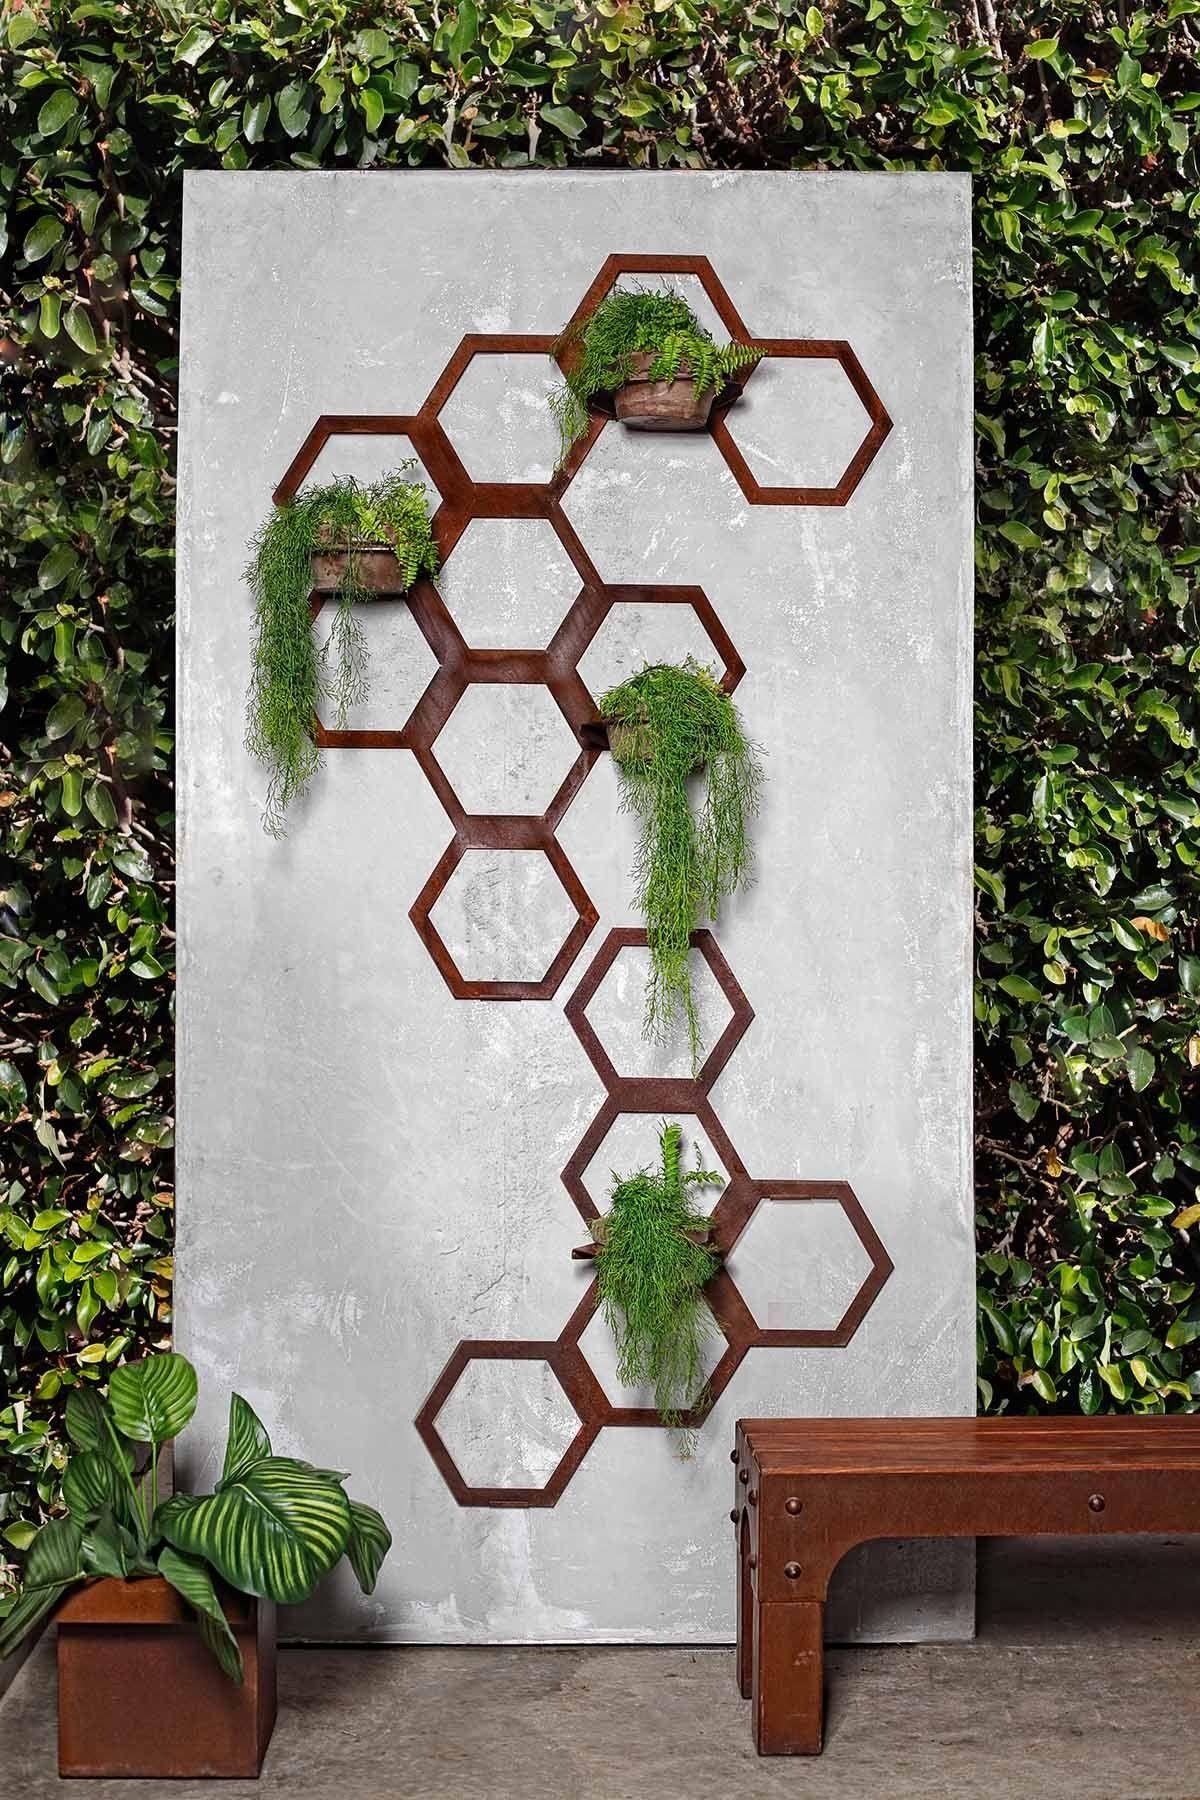 Hexagon Trellis Planters Range Planter Trellis Wall Planters Outdoor Metal Wall Planters